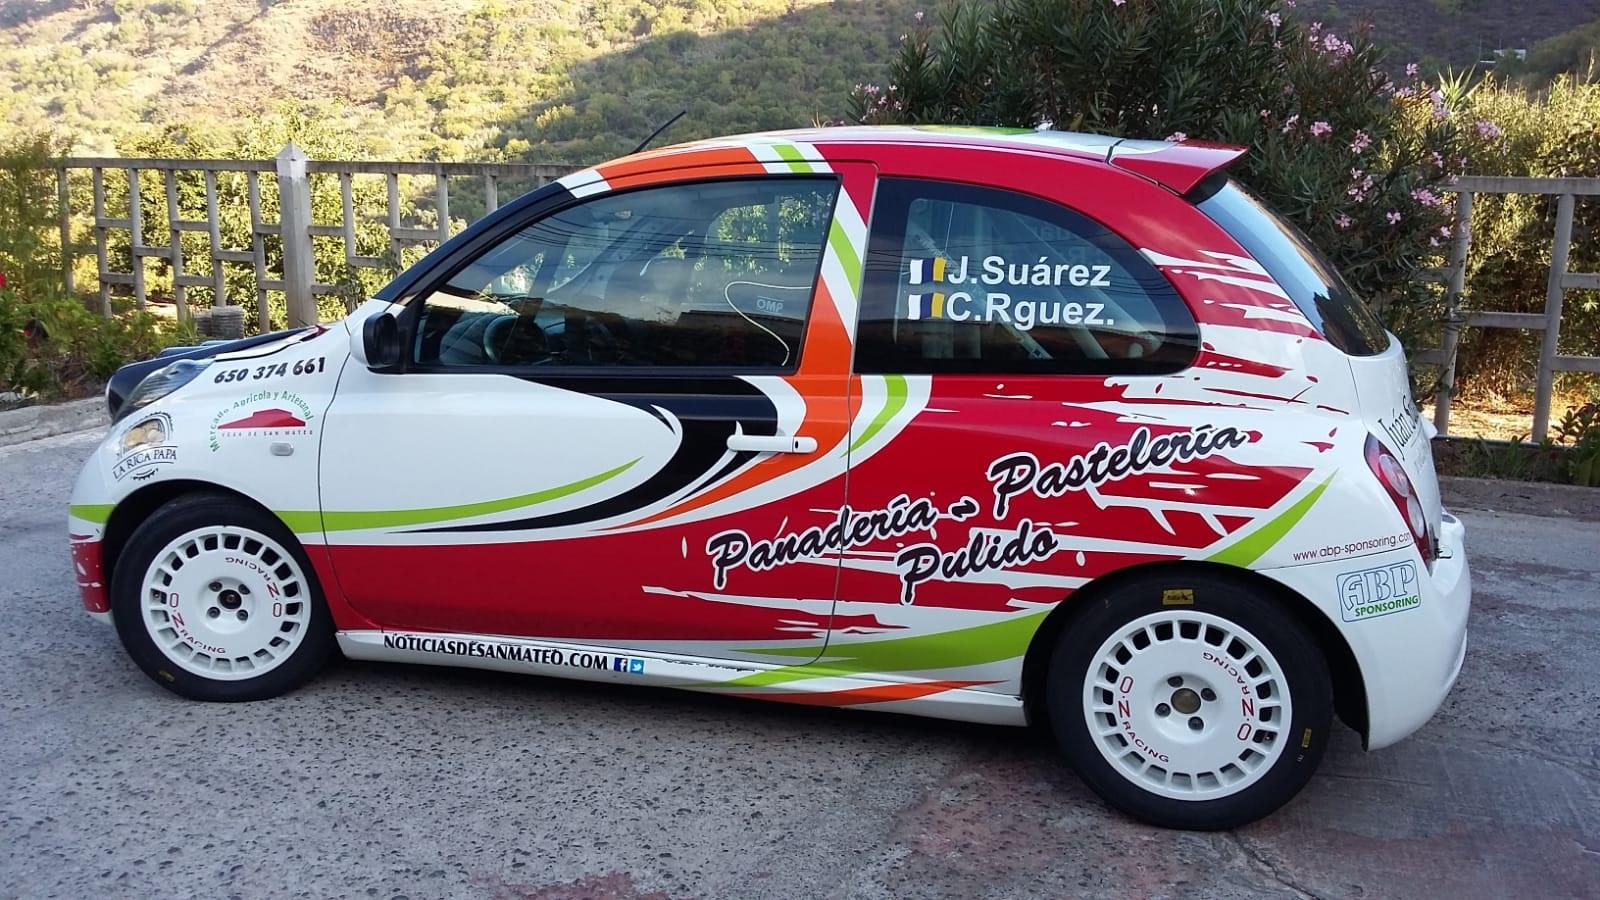 Nissan_Micra_Jorge_Suarez.jpeg